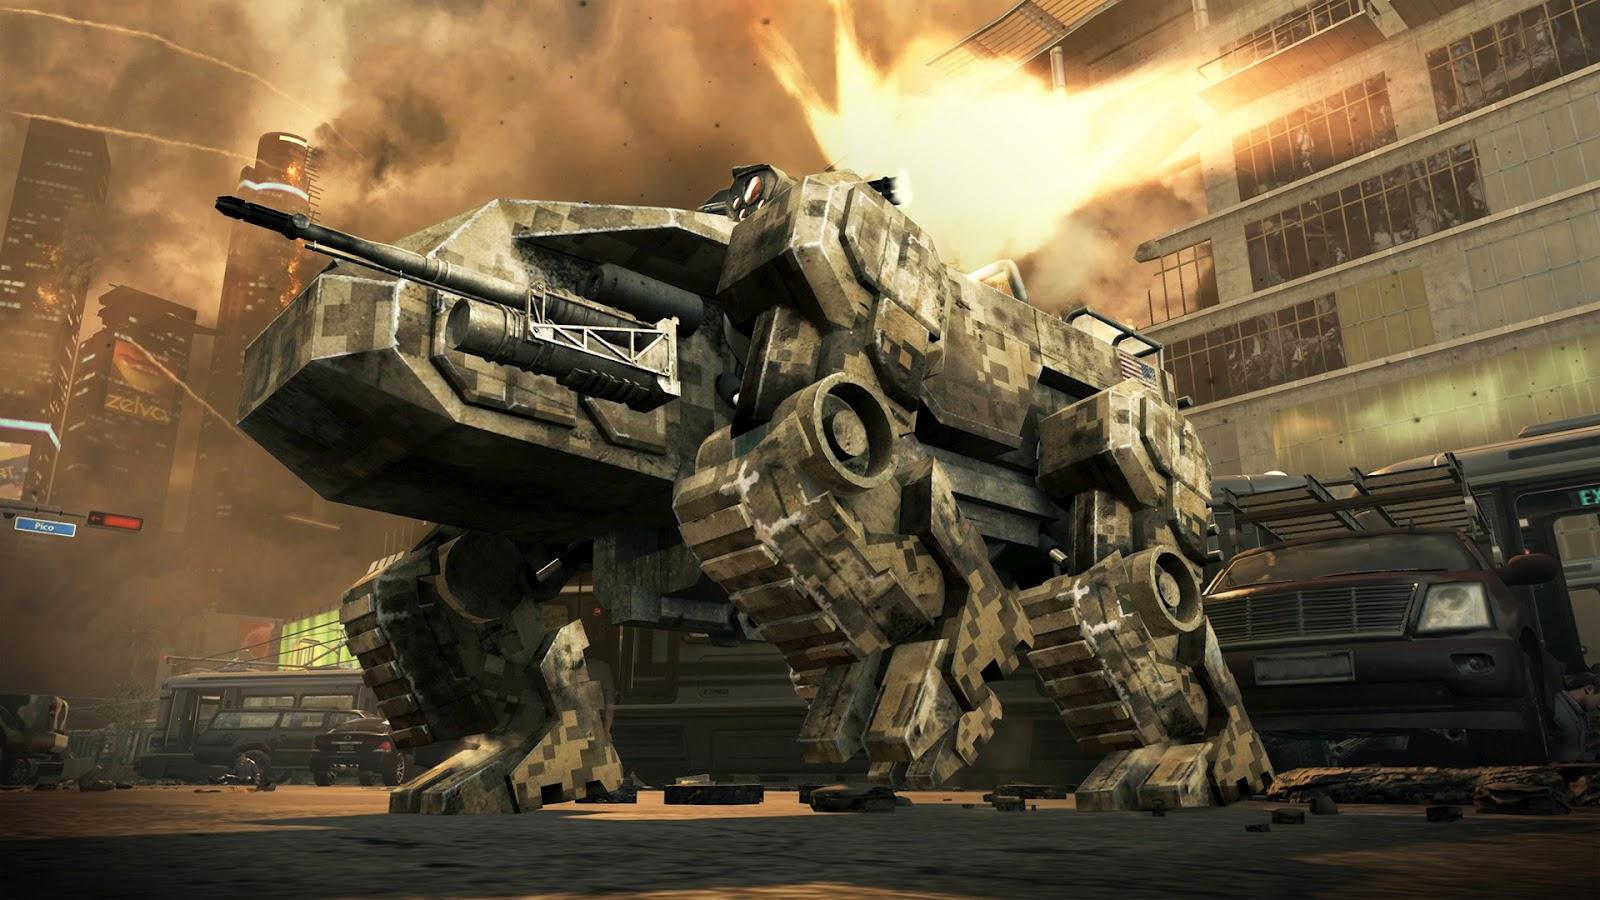 ops 2 desktop wallpaper hd 1080pCall Of Duty Black Ops 2 Full Hd 1080p 1600x900